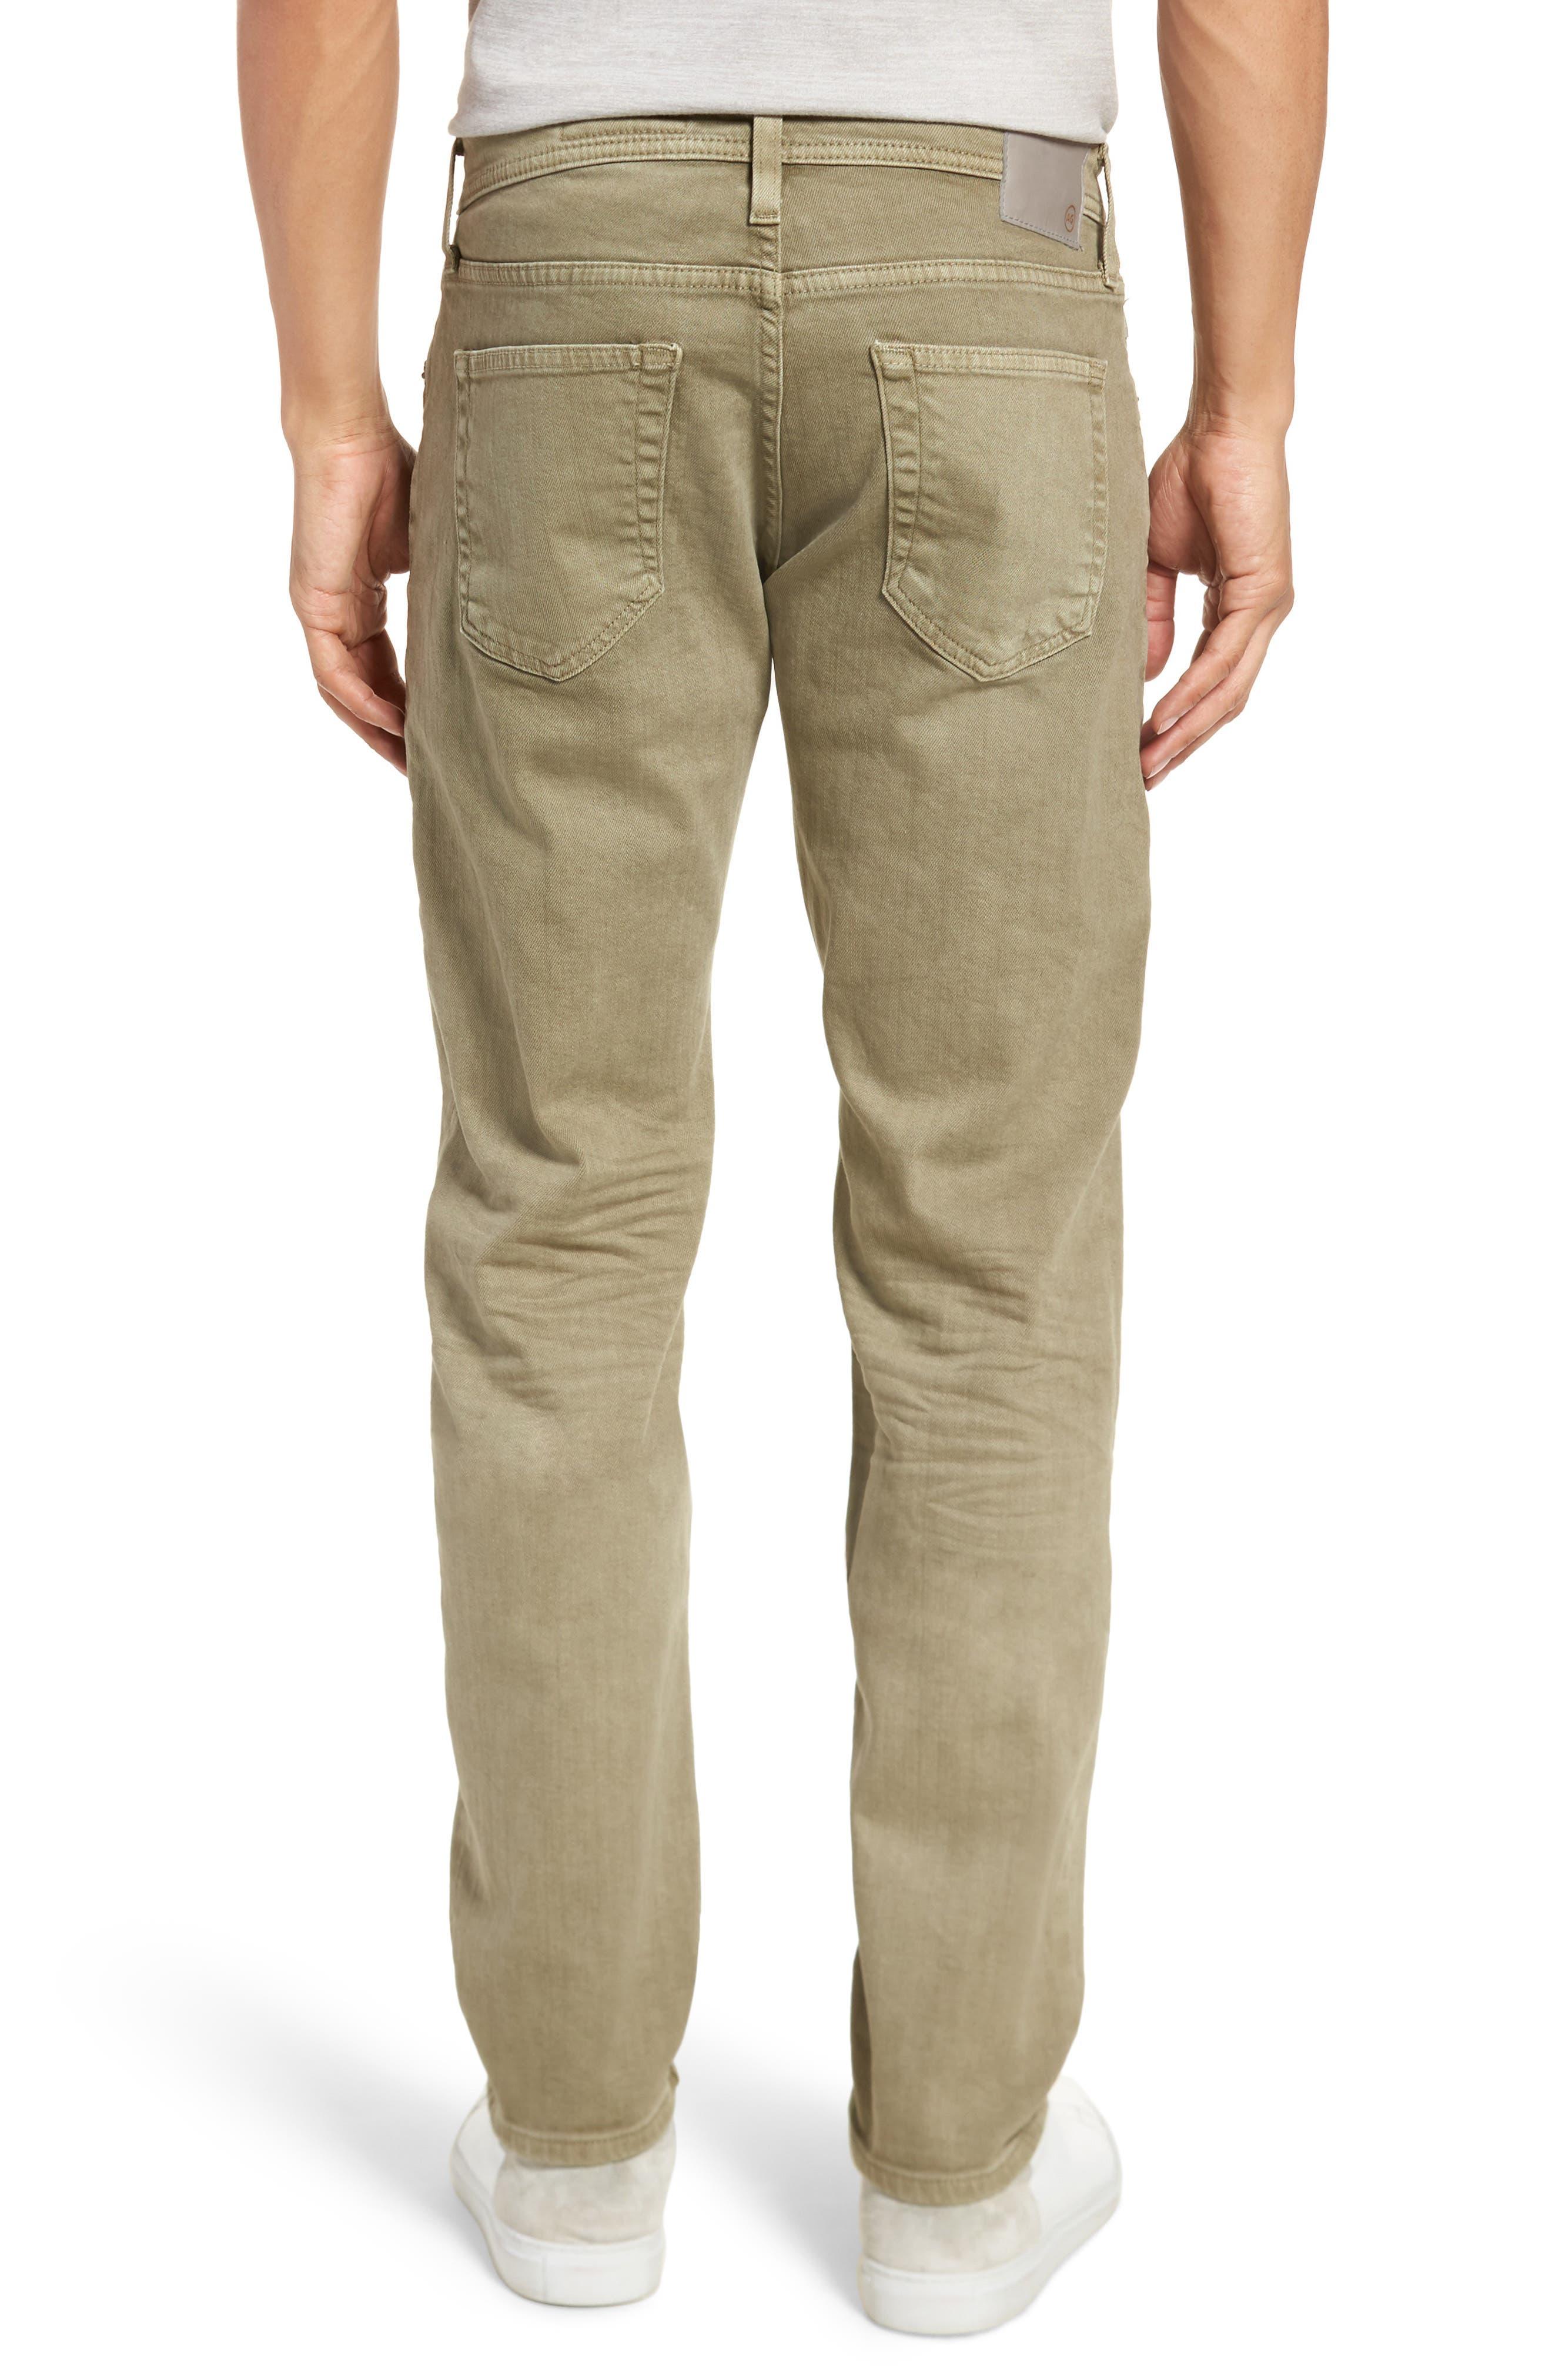 Tellis Slim Fit Jeans,                             Alternate thumbnail 2, color,                             7 Years Dry Cypress